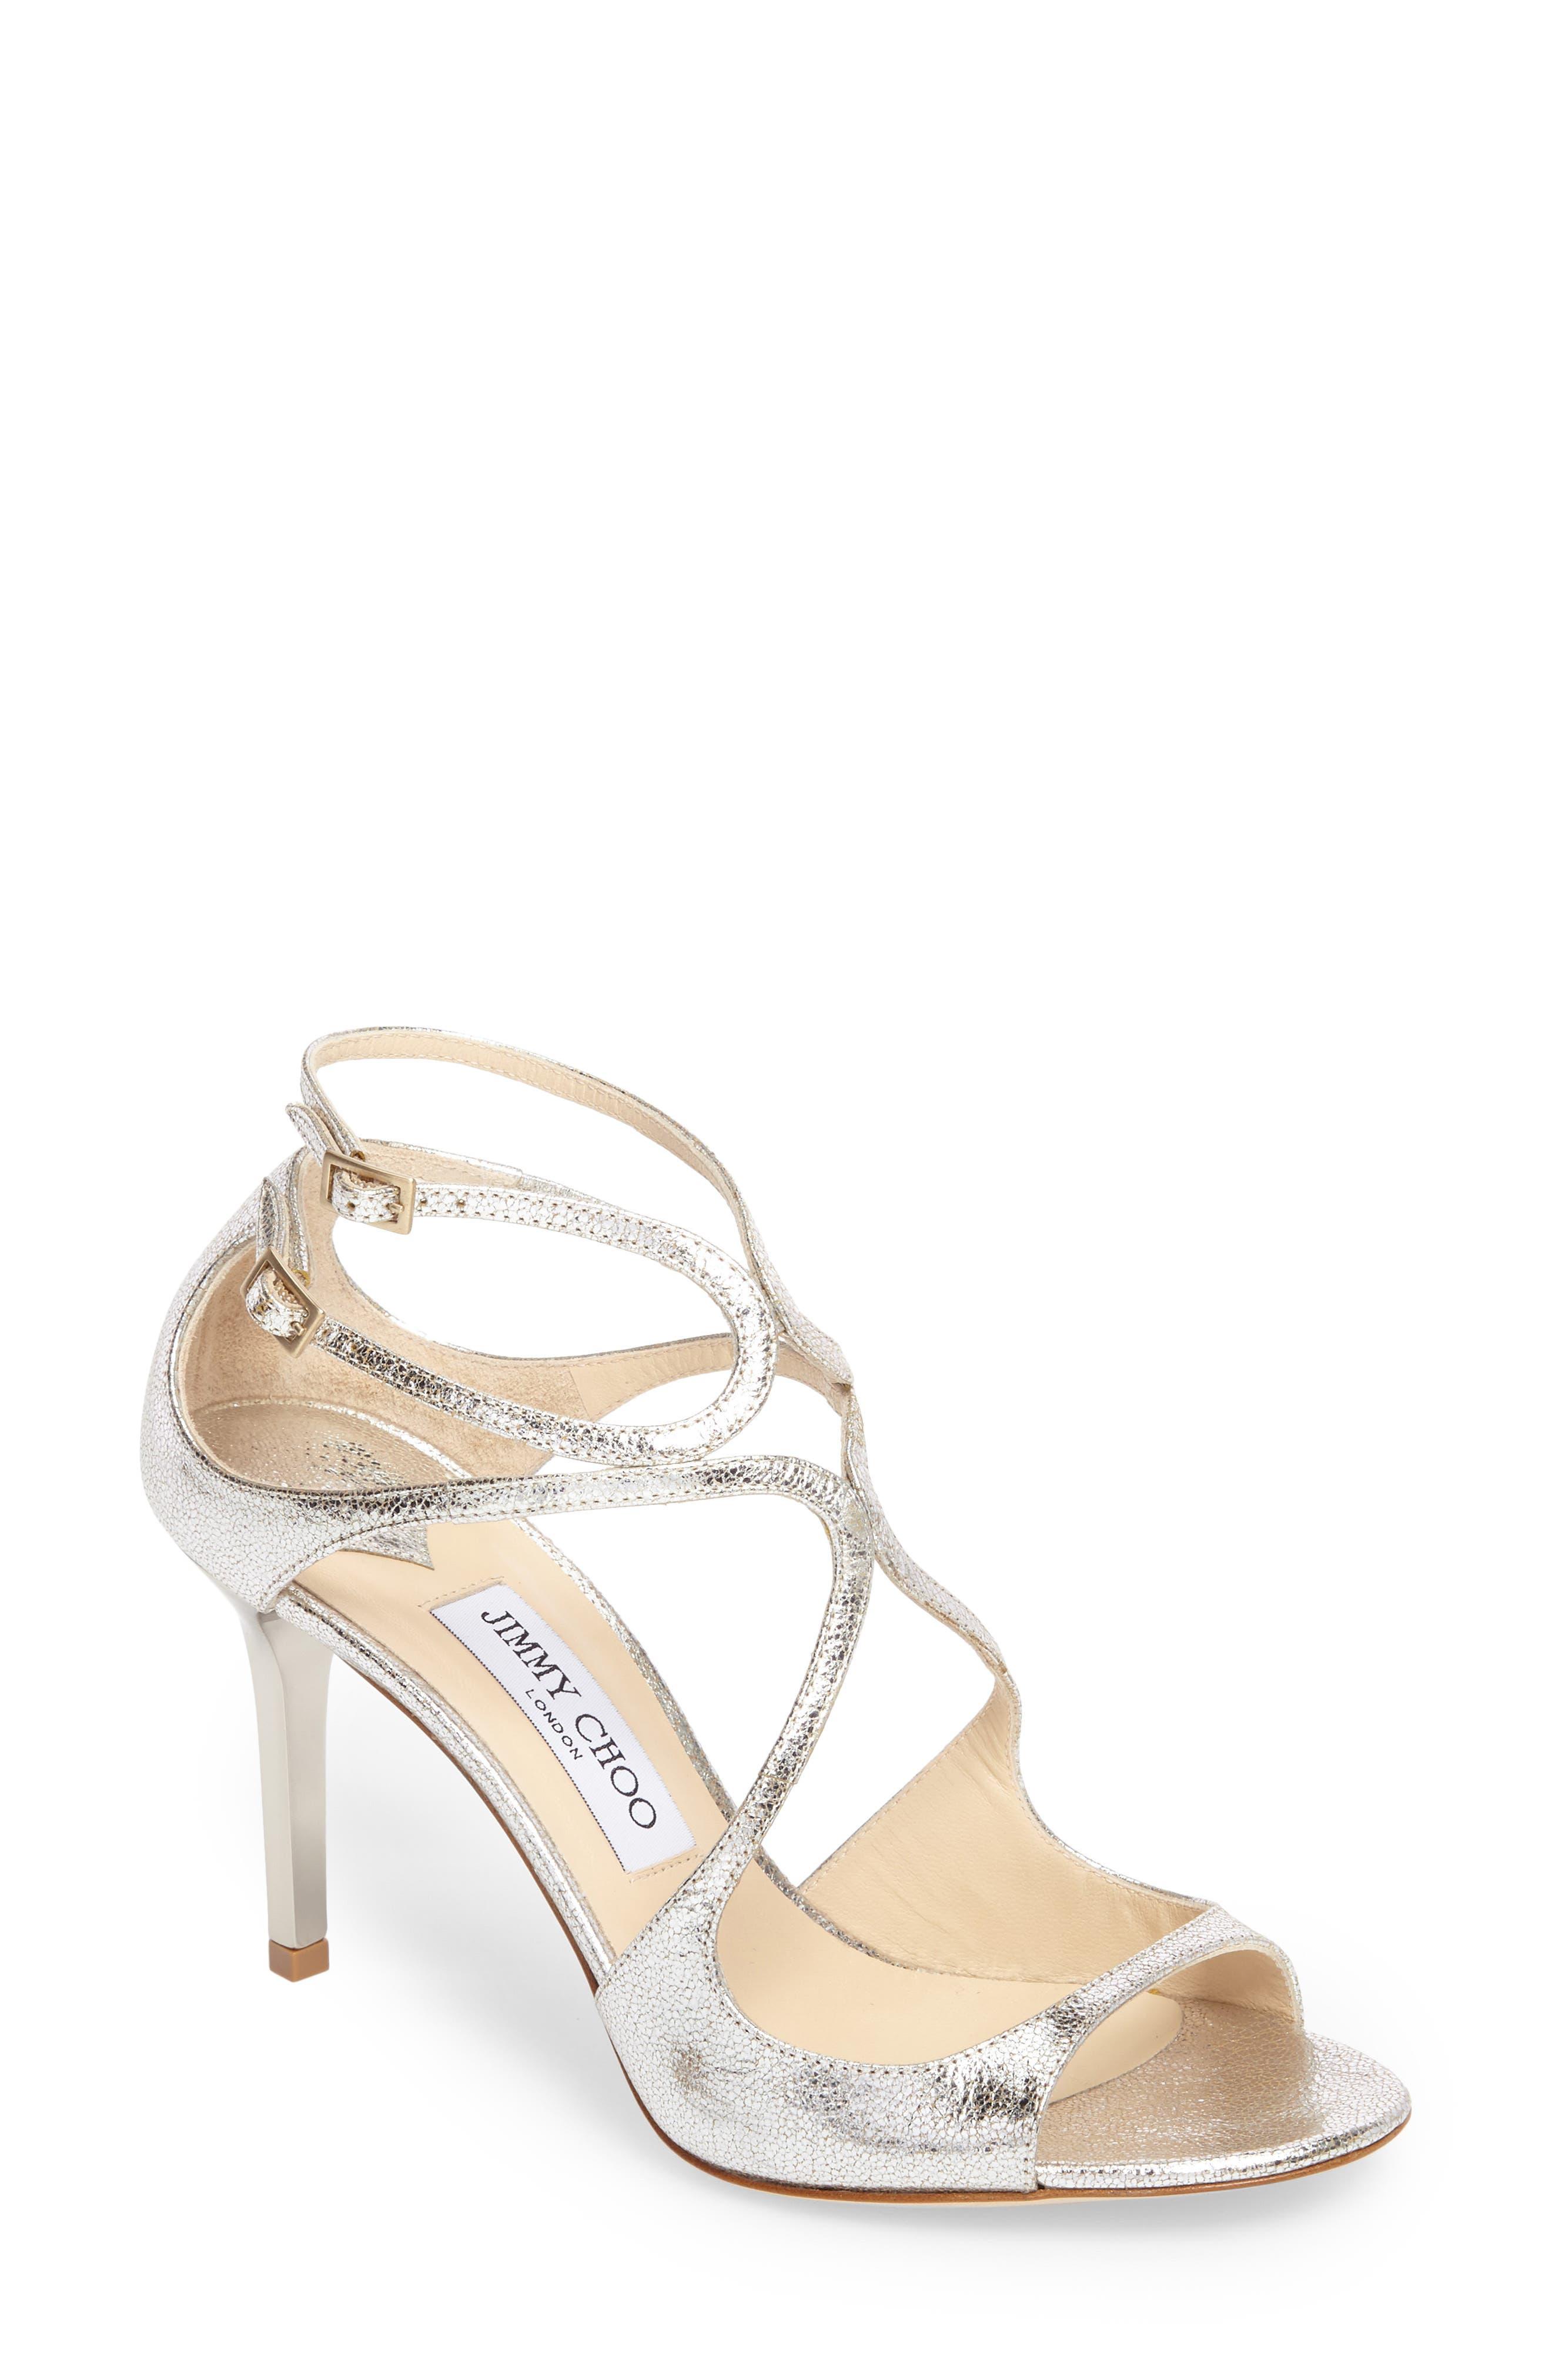 63a780e56c7 Women s Jimmy Choo Wedding Shoes